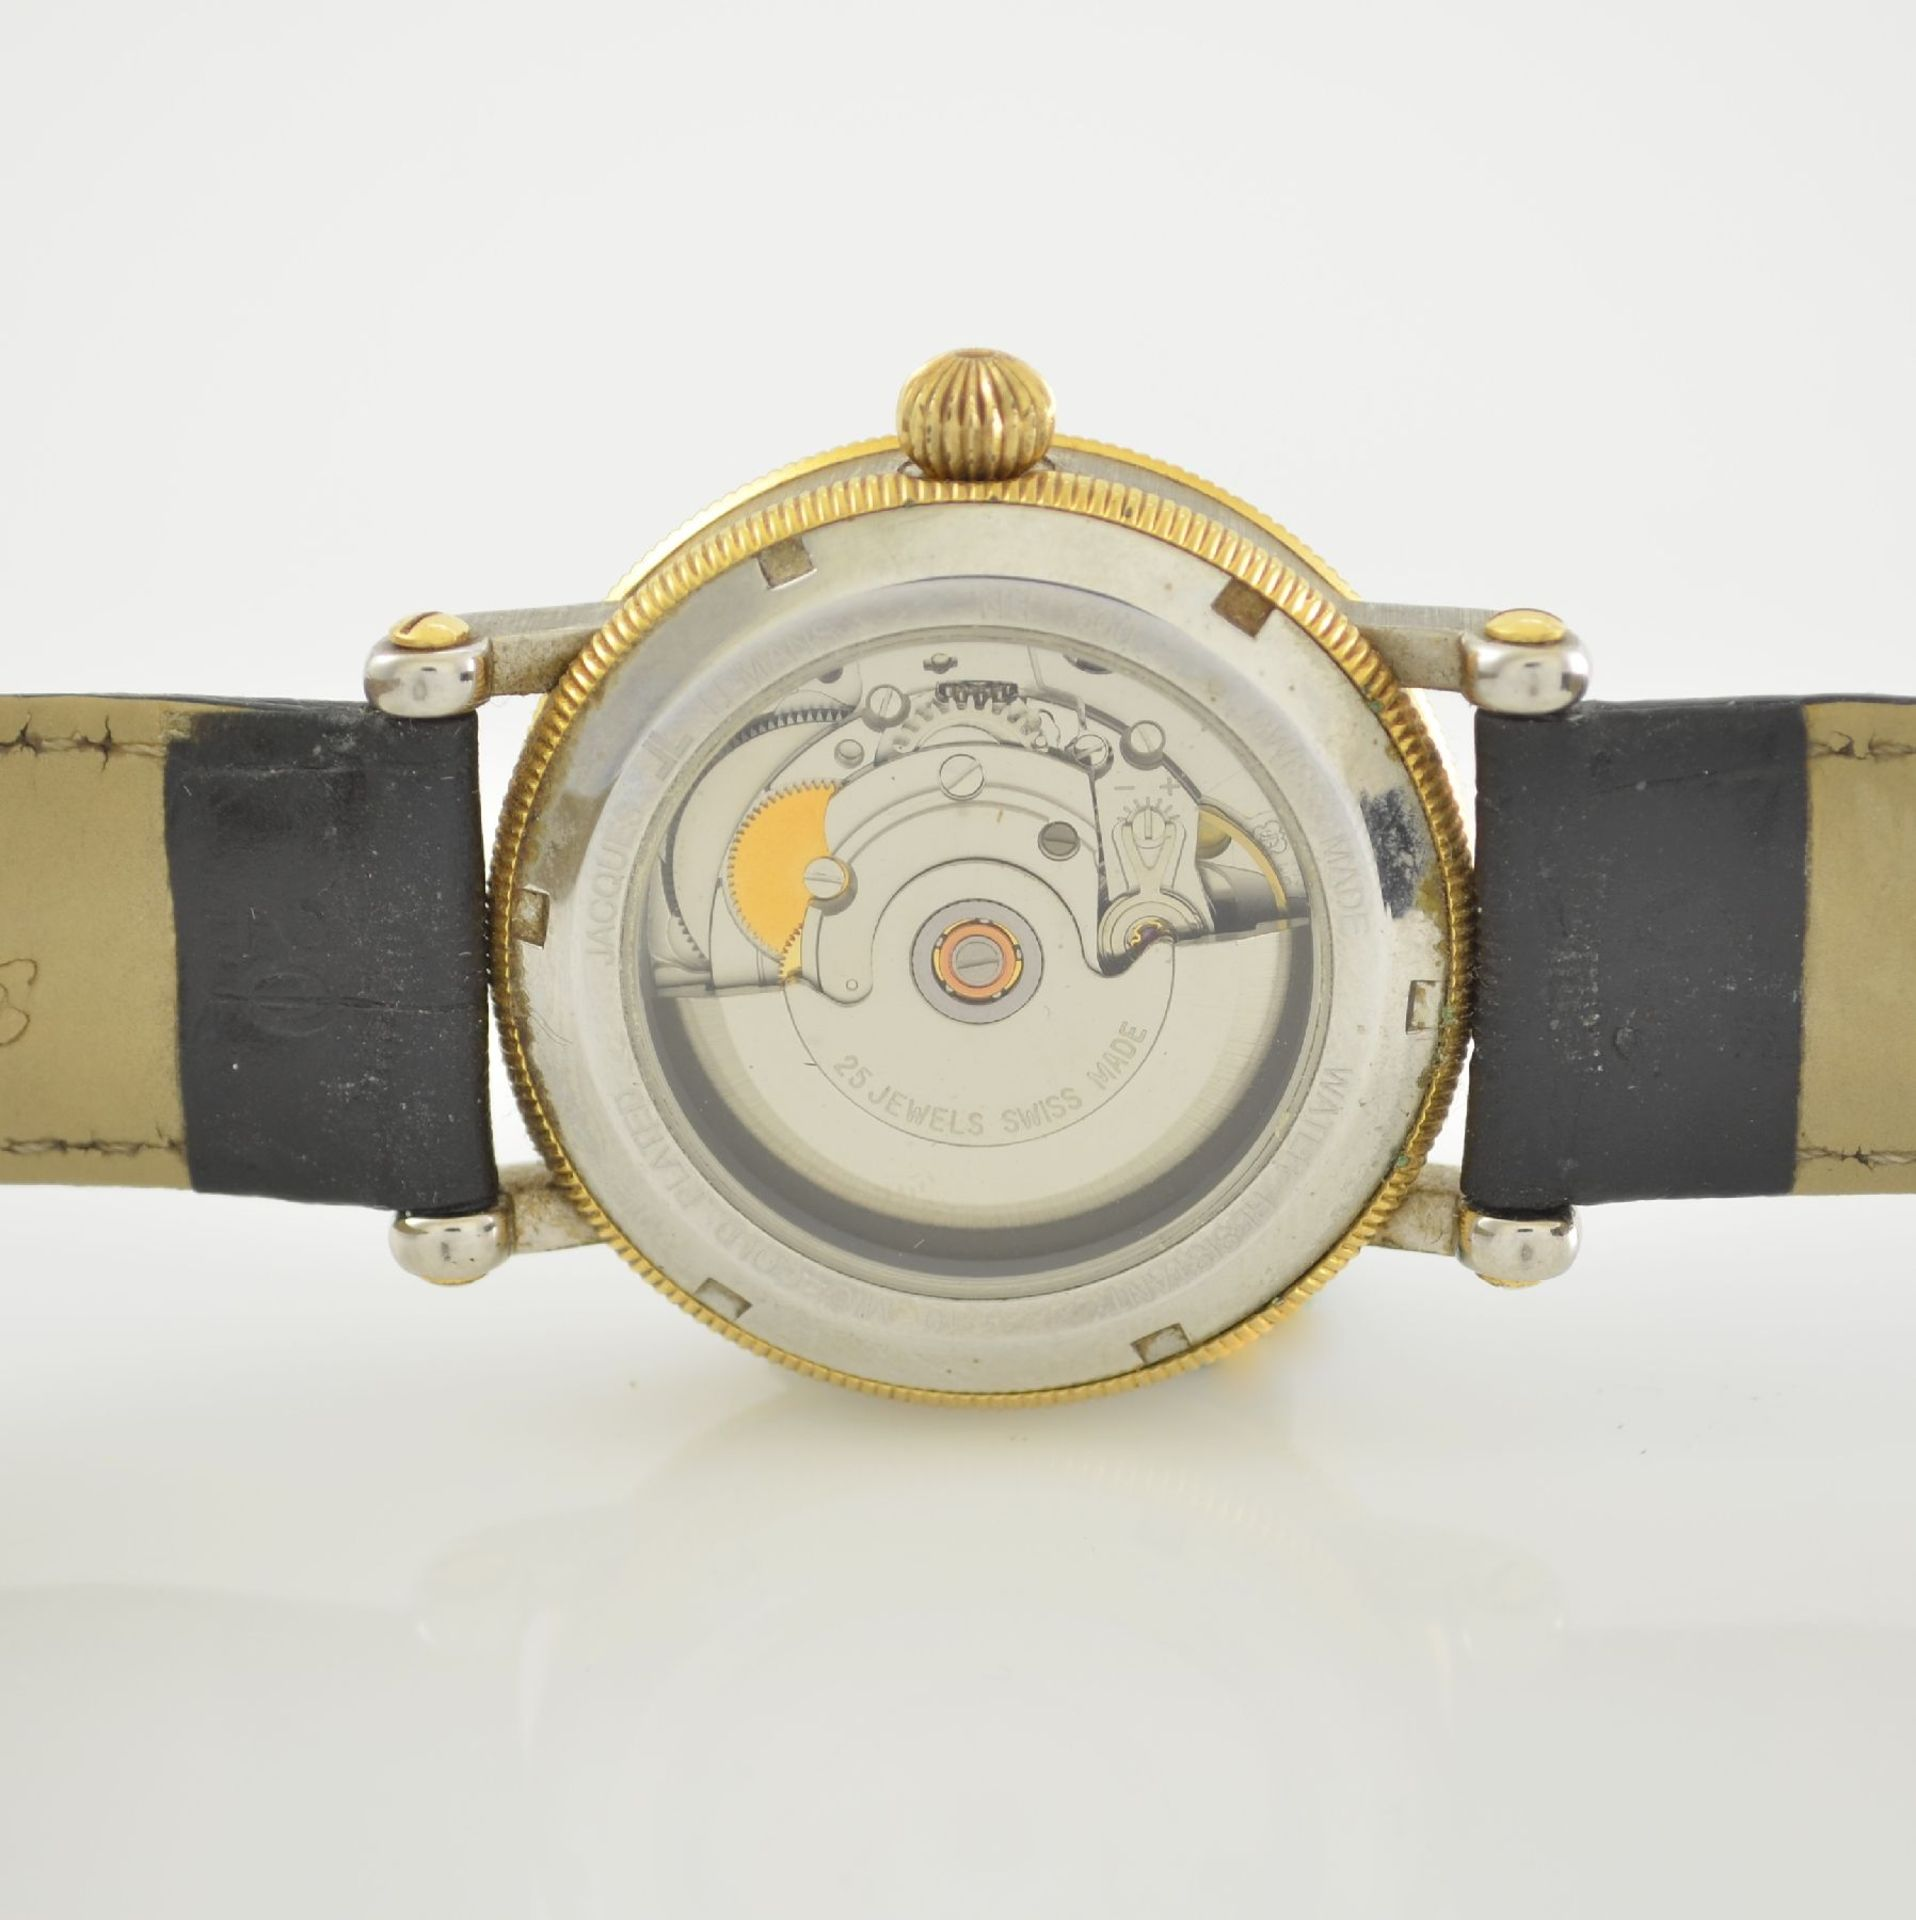 Konvolut: 2 Herrenarmbanduhren, Jacques Lemans& Gardé, Schweiz um 1995, Automatik, beids. vergl. - Bild 7 aus 14